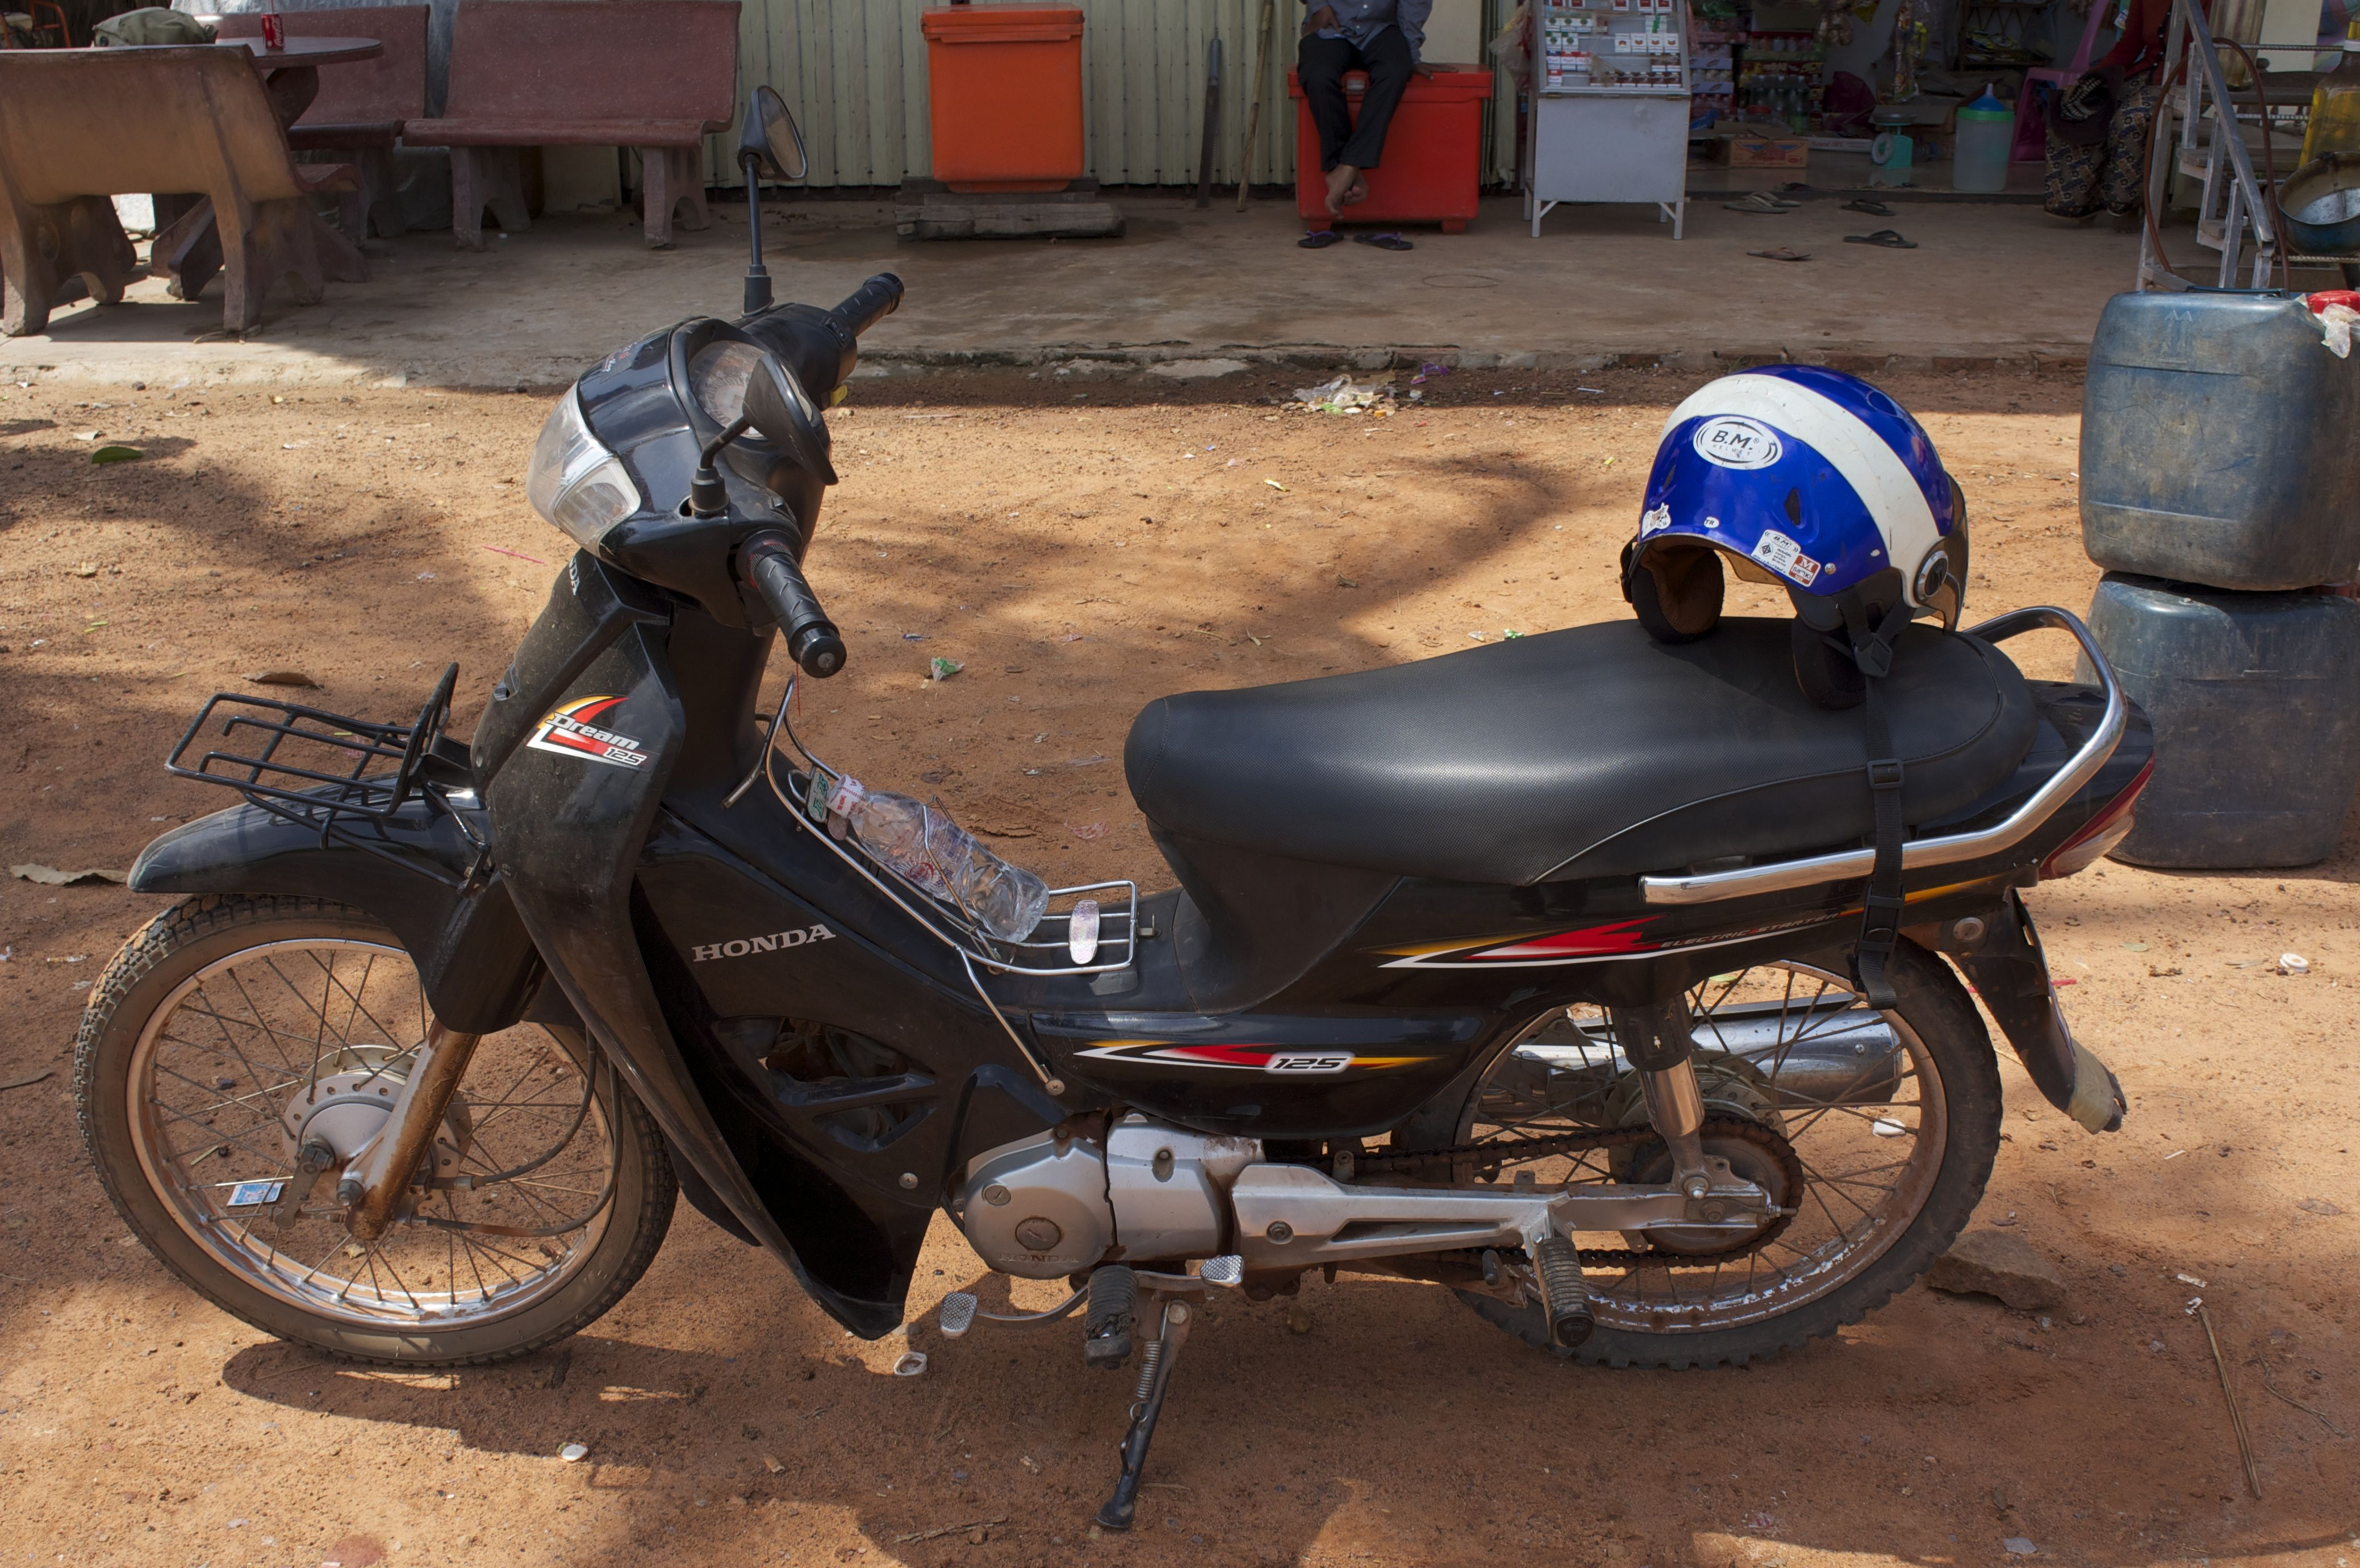 cambodia:motorcycle to chau srey vibol, part 1 - james trumm